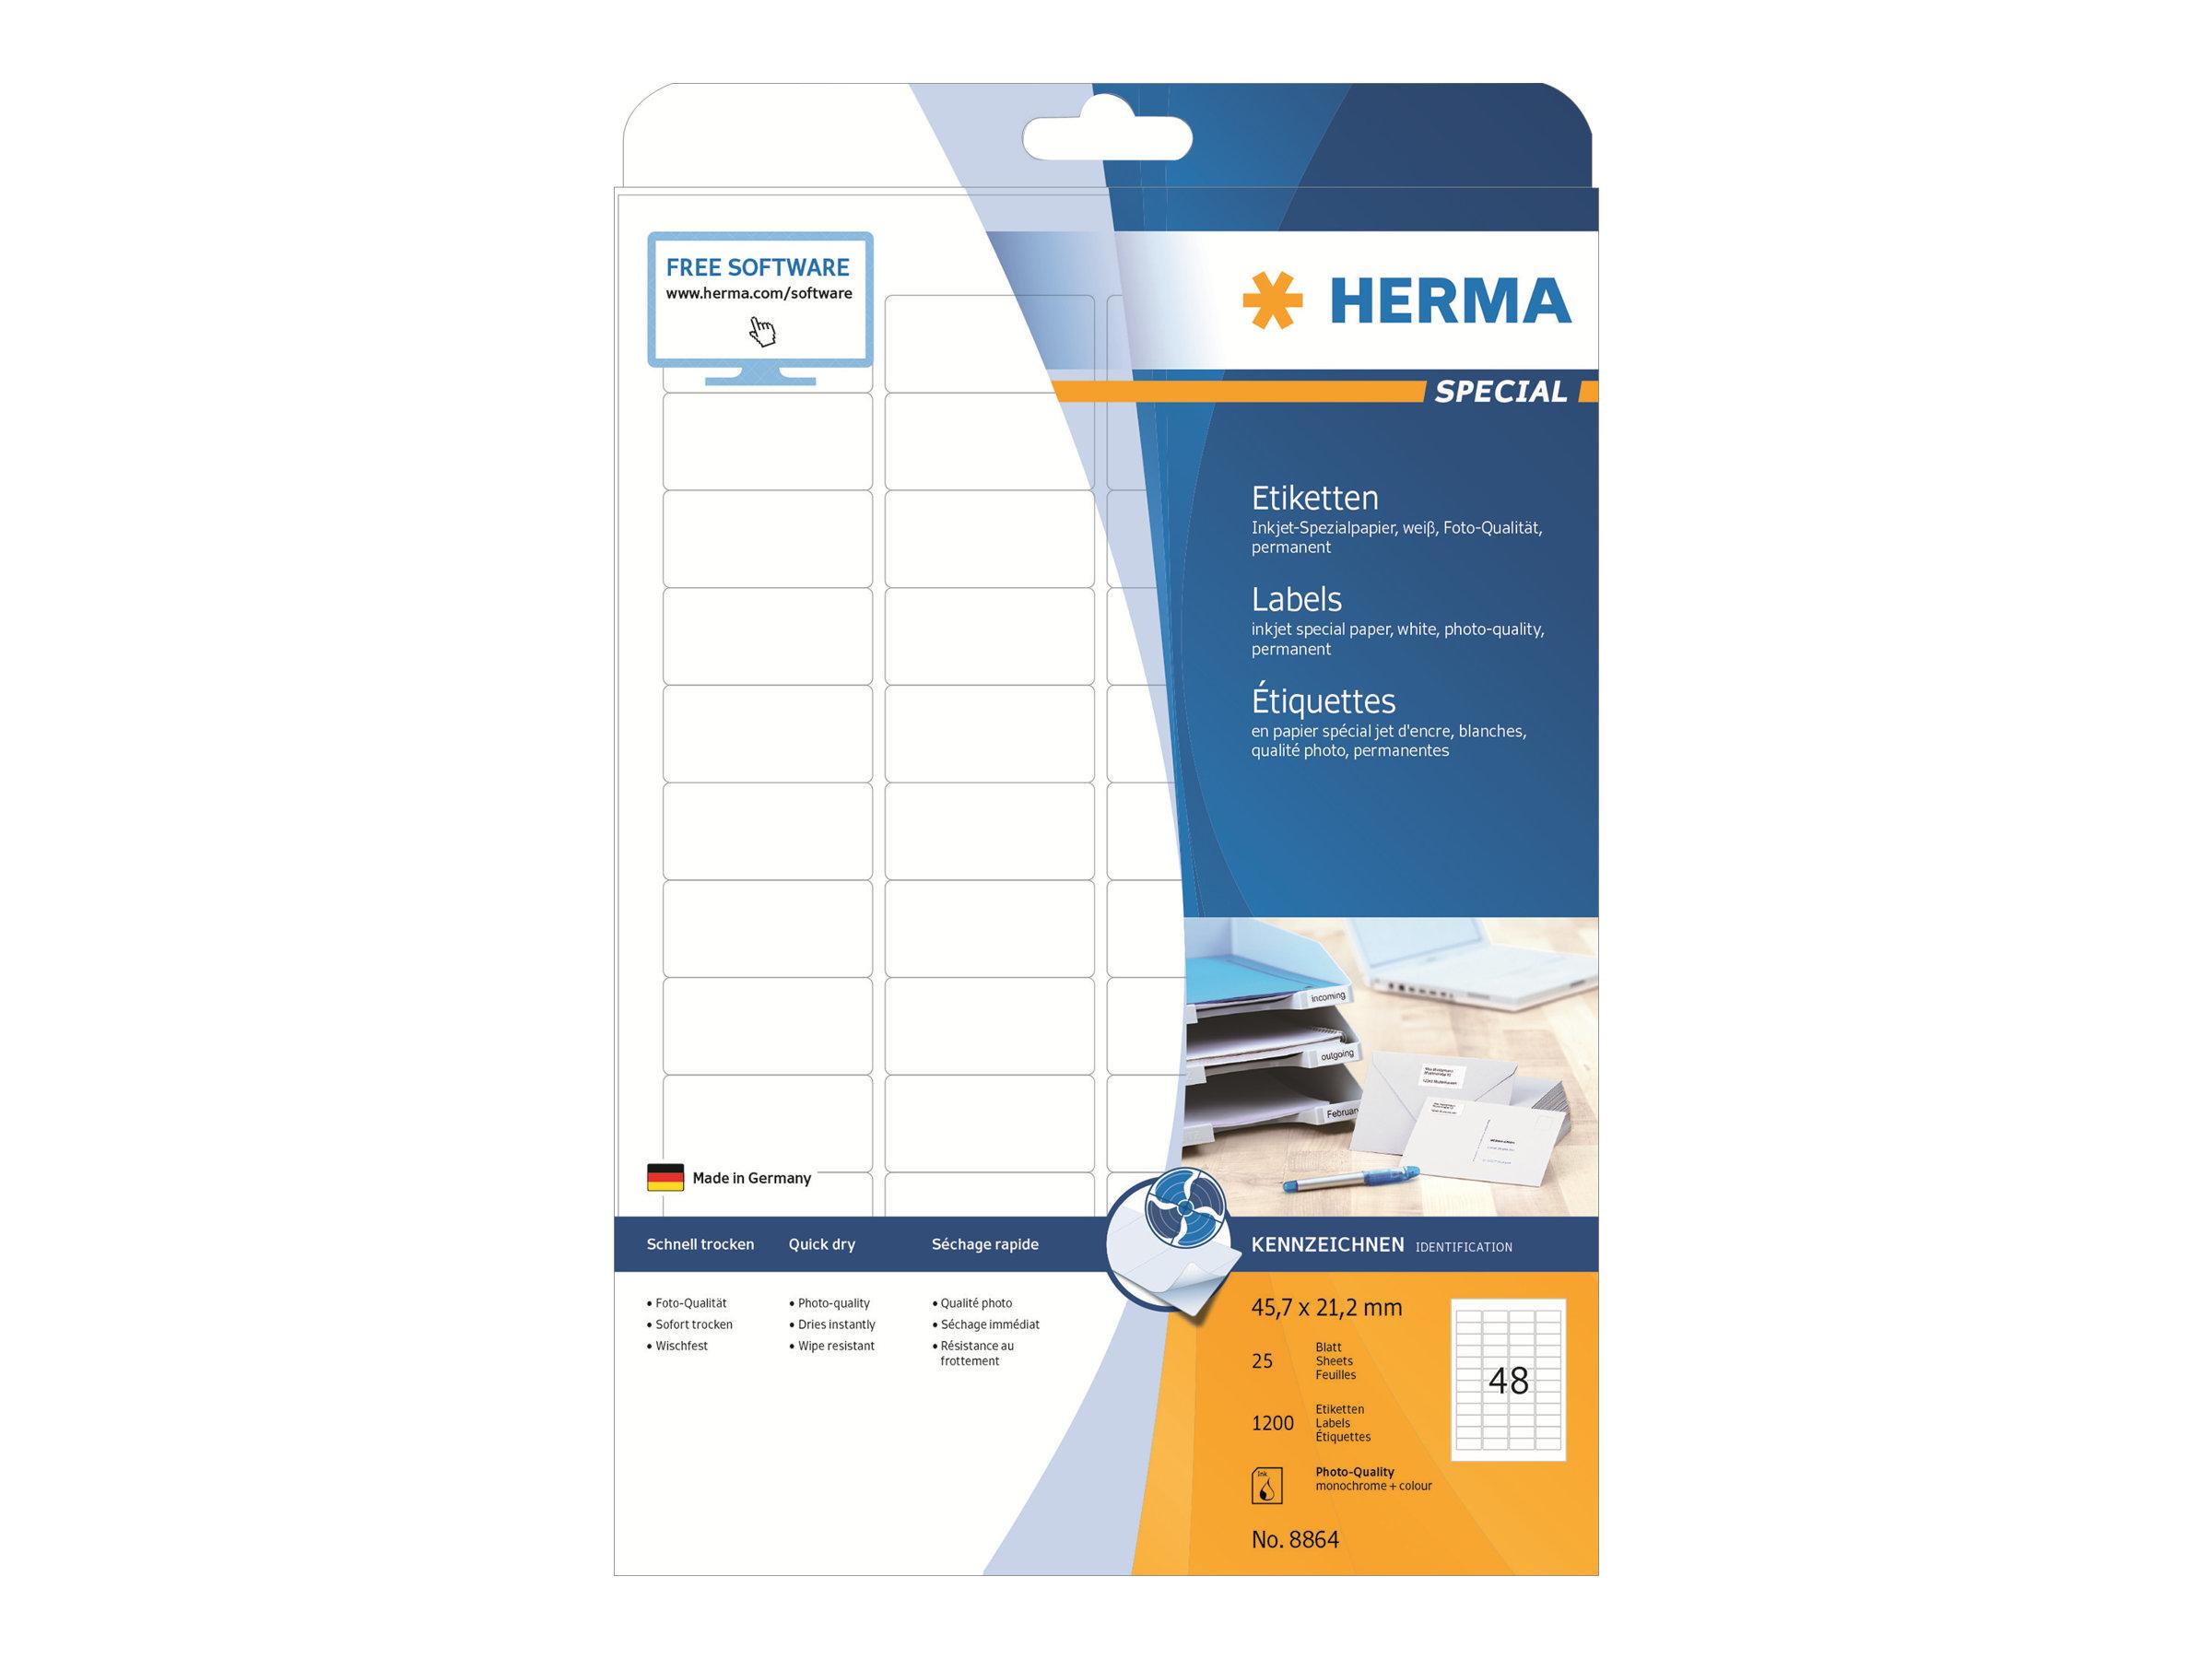 HERMA Special - Papier - matt - permanent selbstklebend - beschichtet - weiß - 45.7 x 21.2 mm - 90 g/m² - 1200 Etikett(en) (25 Bogen x 48)